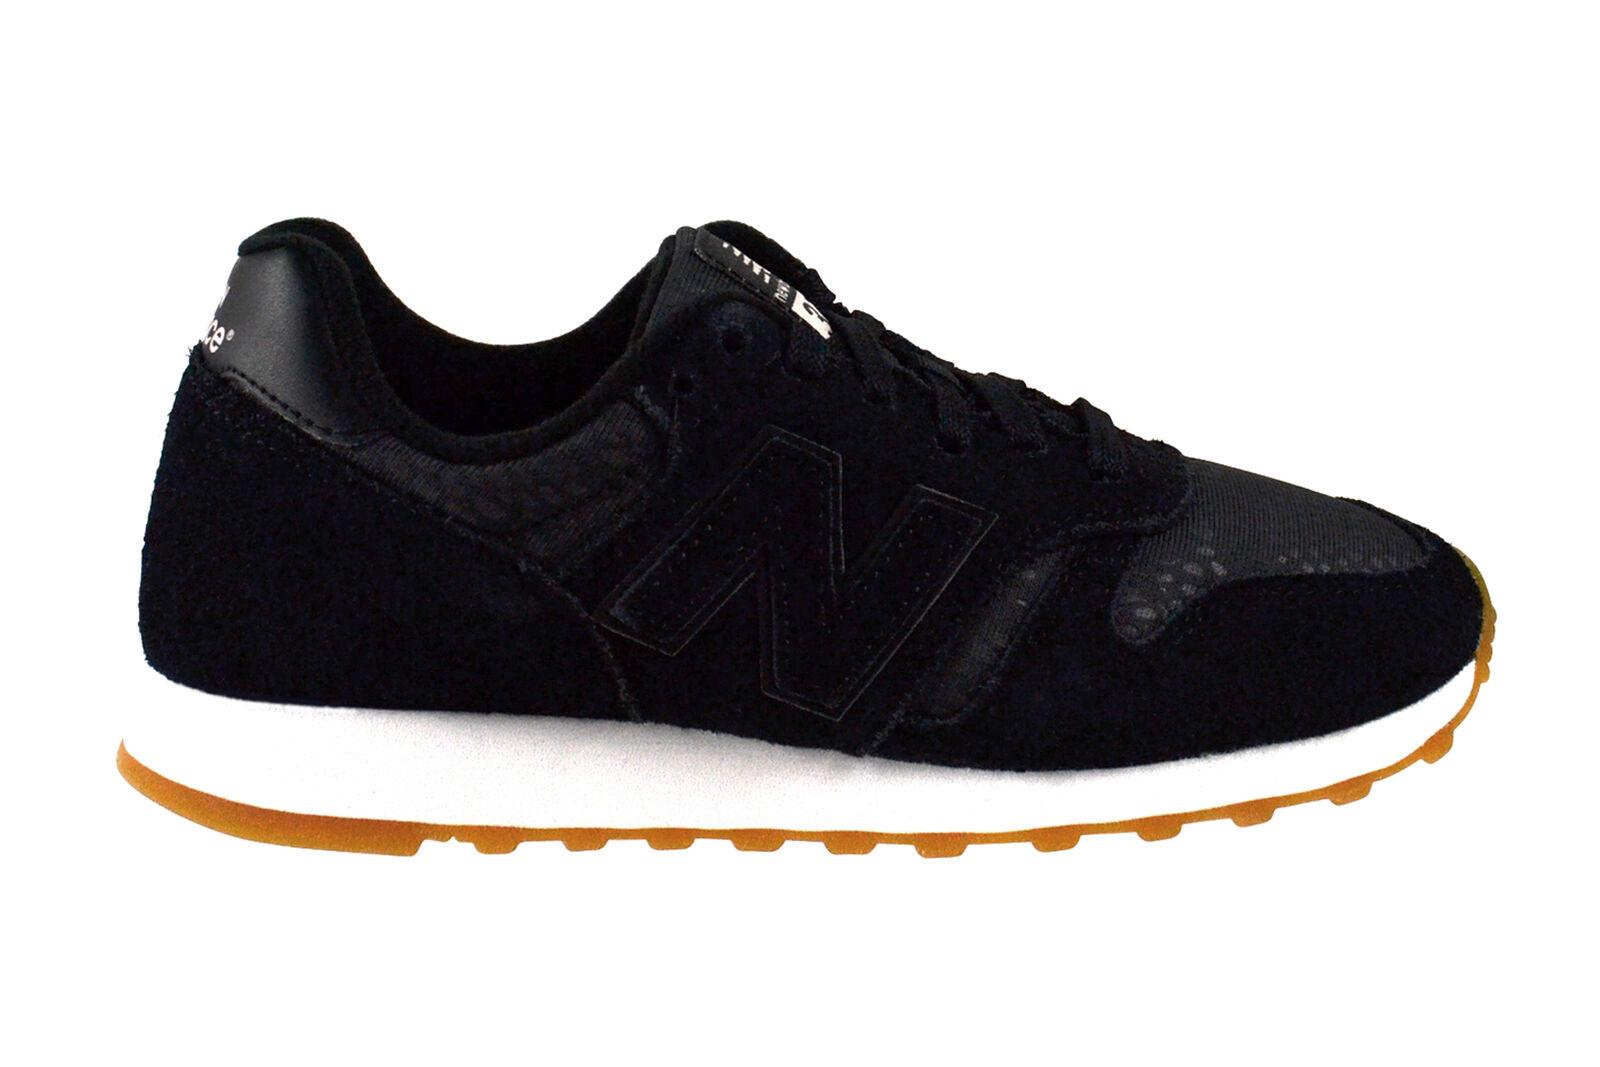 New Balance WL373 BL schwarz Schuhe Sneaker schwarz